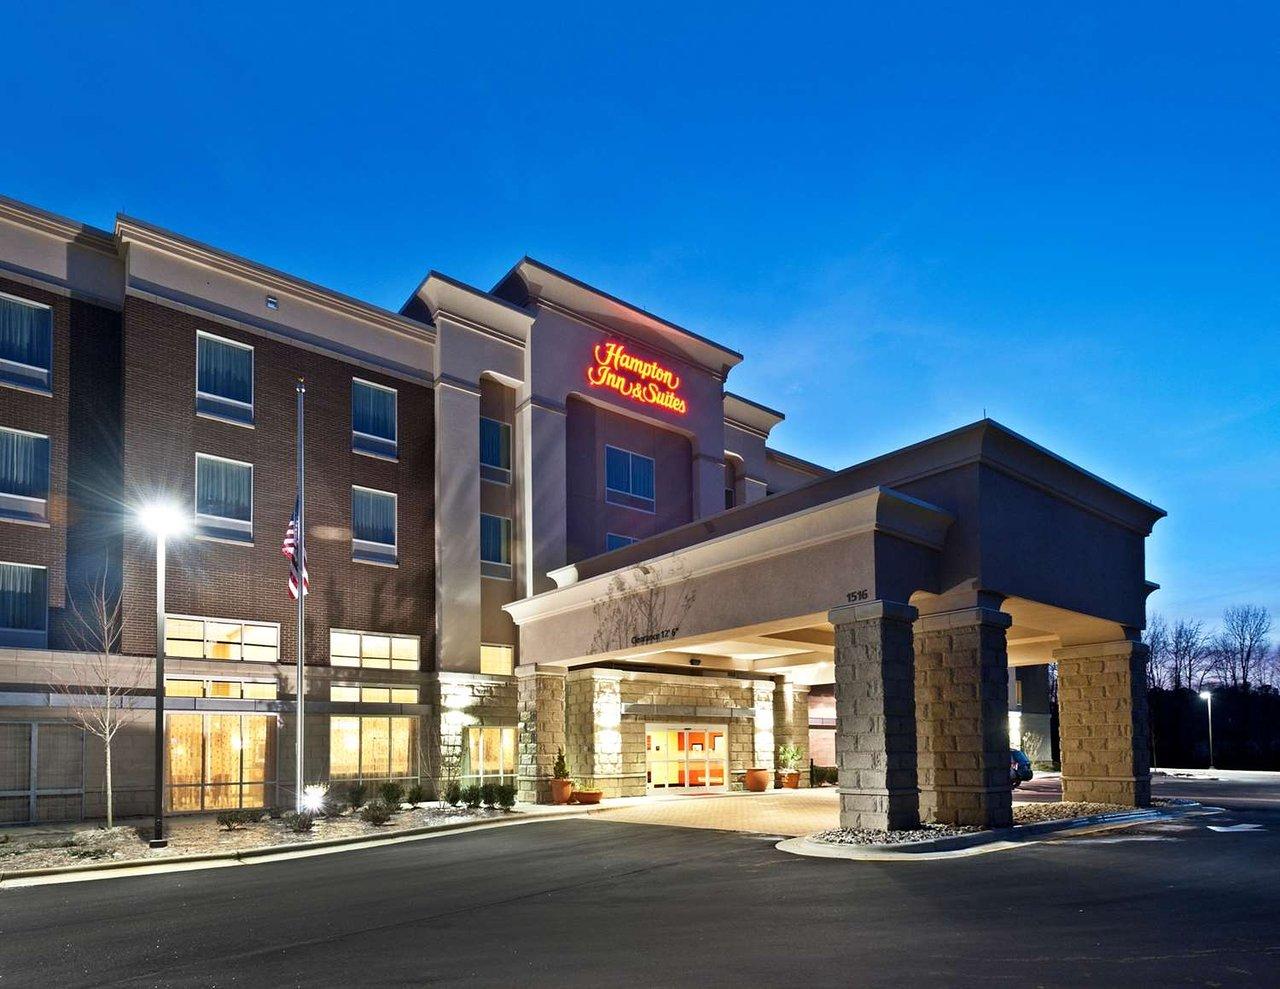 hampton inn suites holly springs 105 1 3 8 updated 2019 rh tripadvisor com